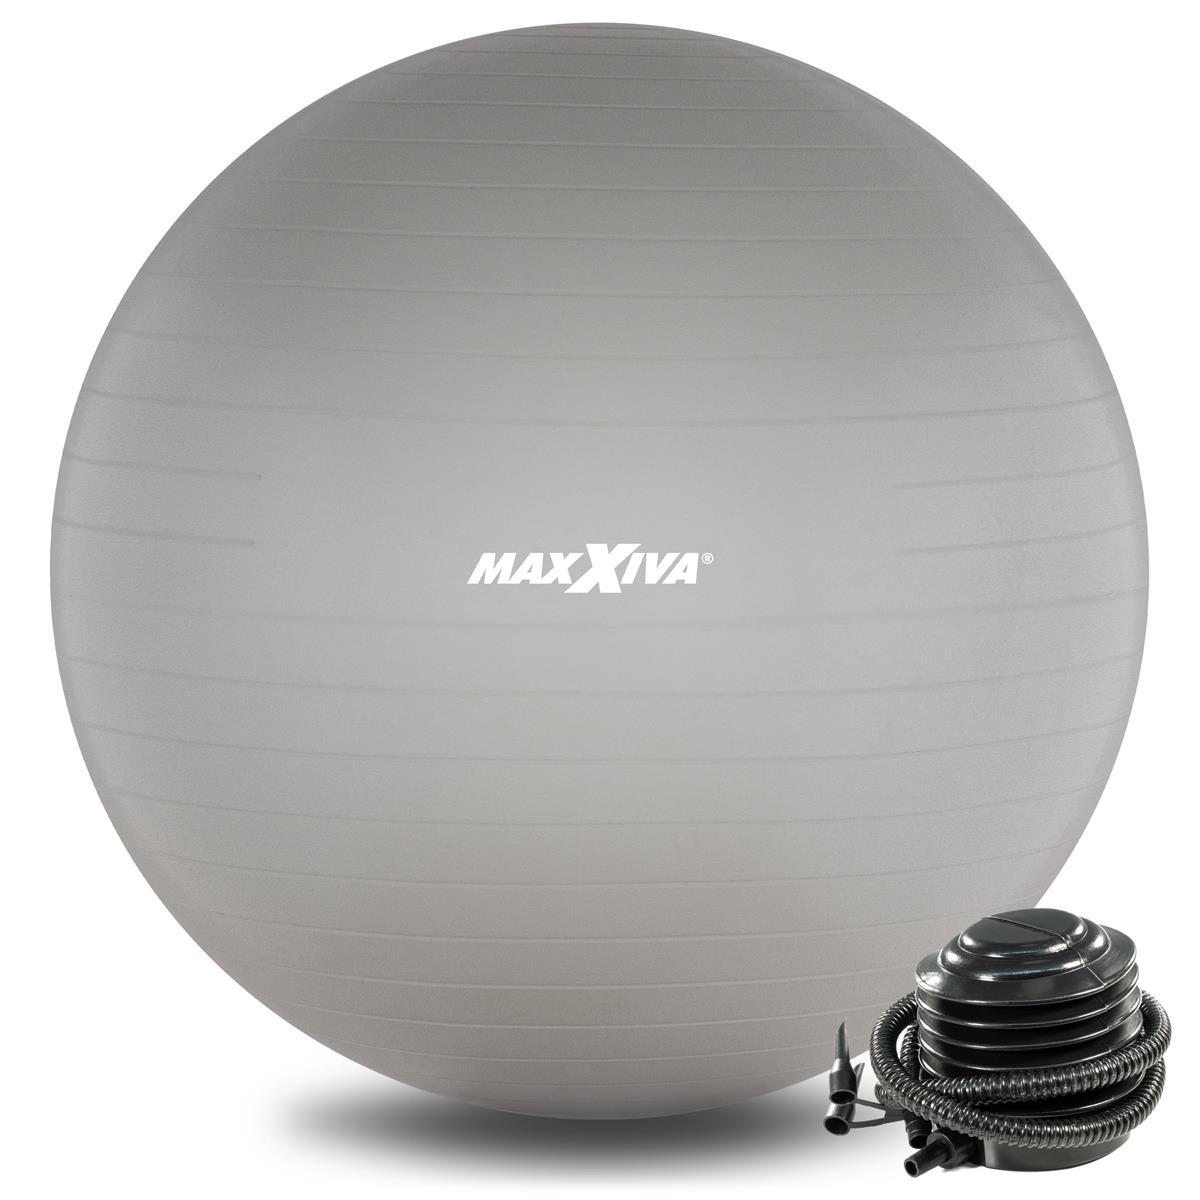 MAXXIVA Gymnastikball Ø 55 cm Silber mit Pumpe Sitzball Fitness Yoga Pilates